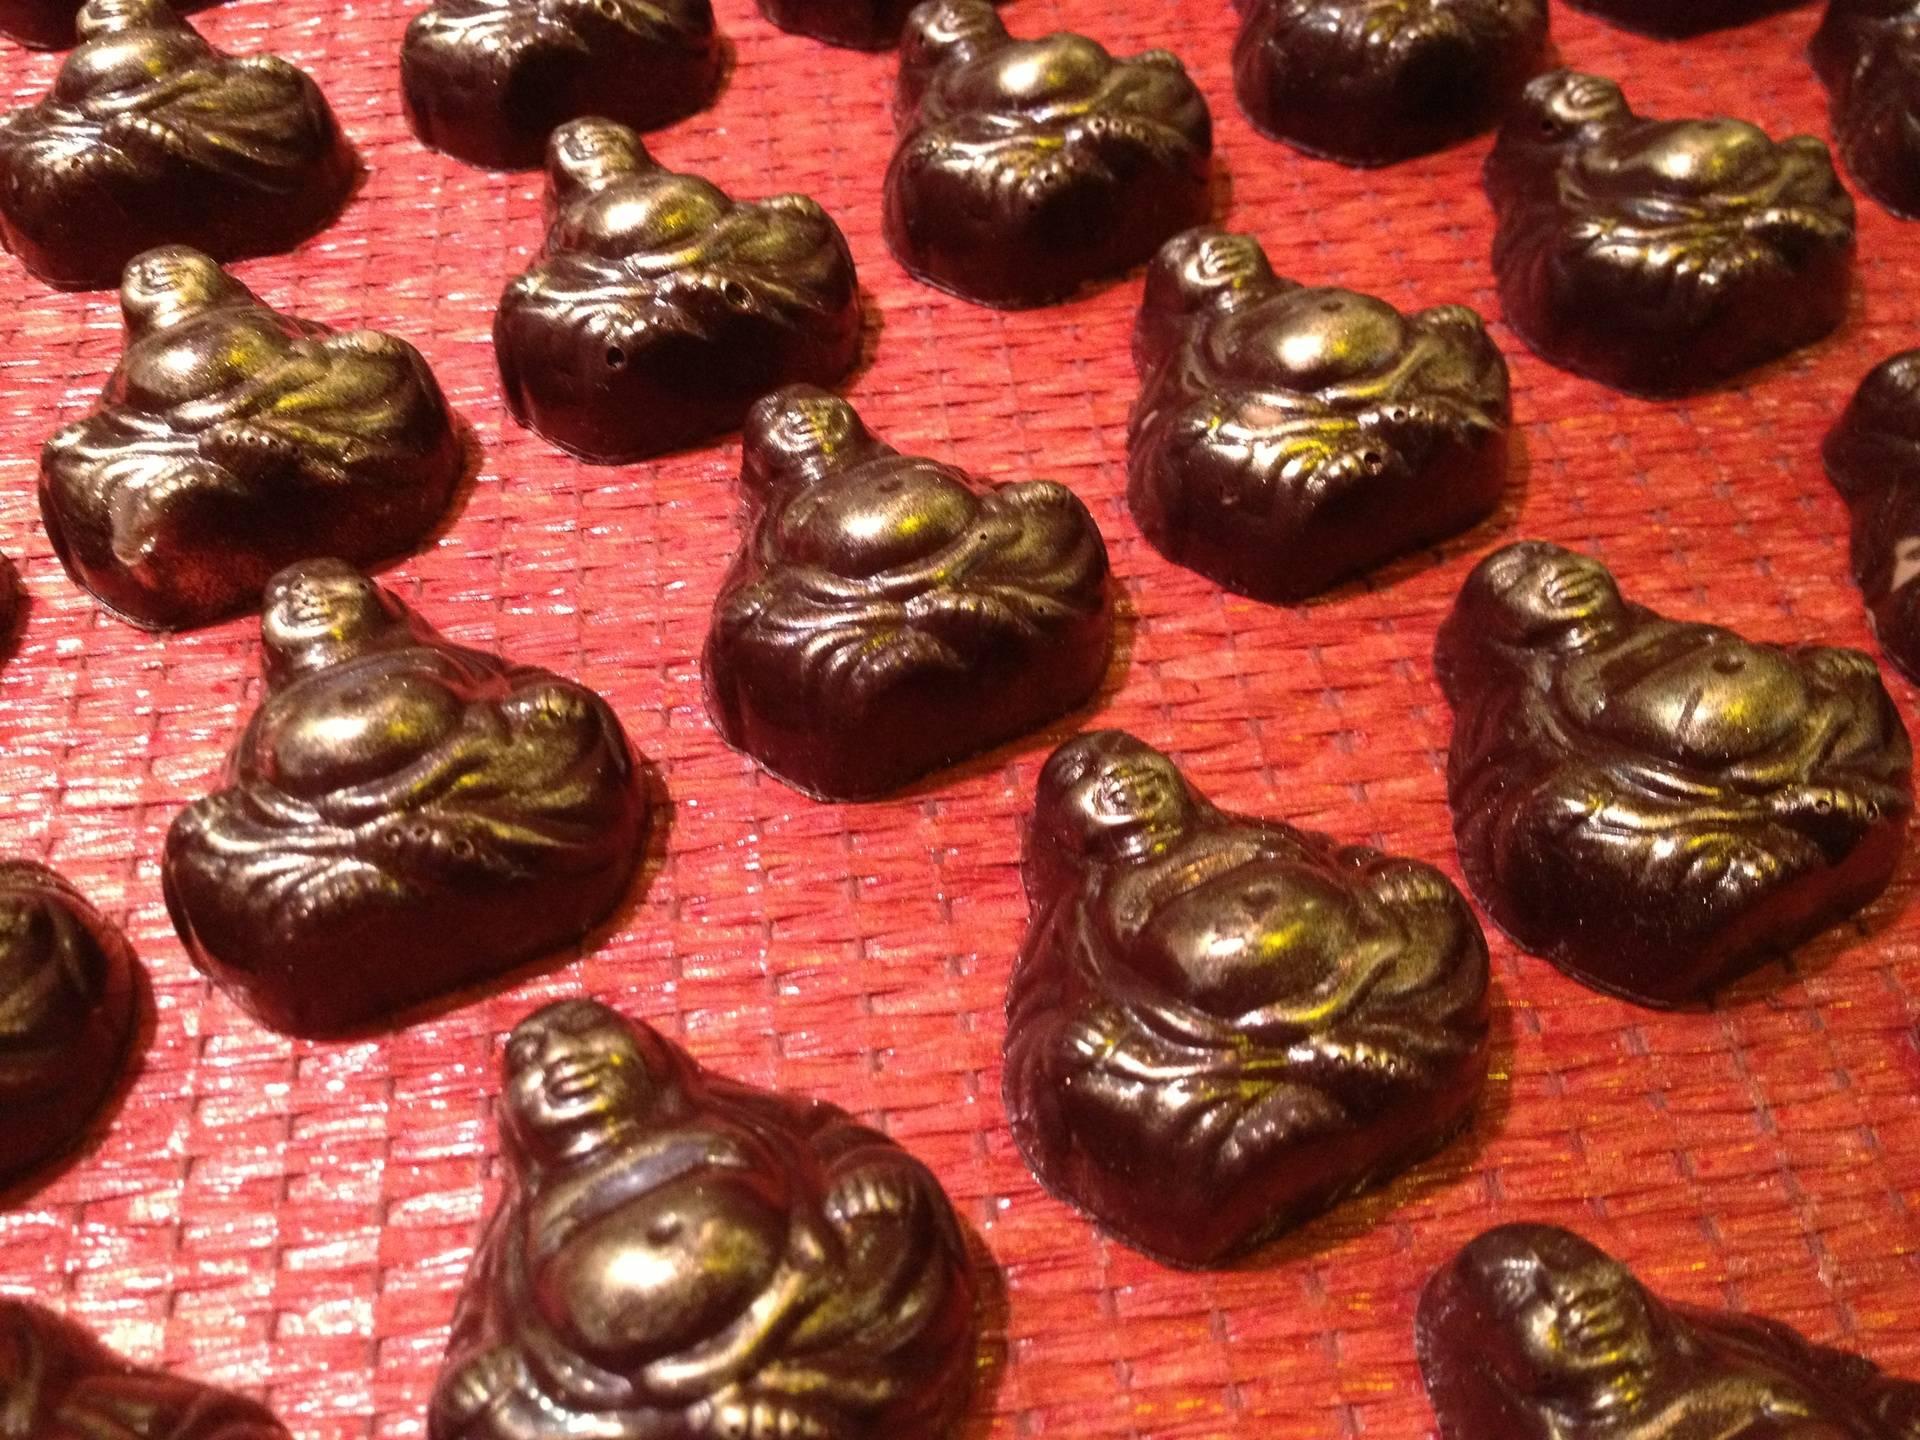 Buddah Chocolates